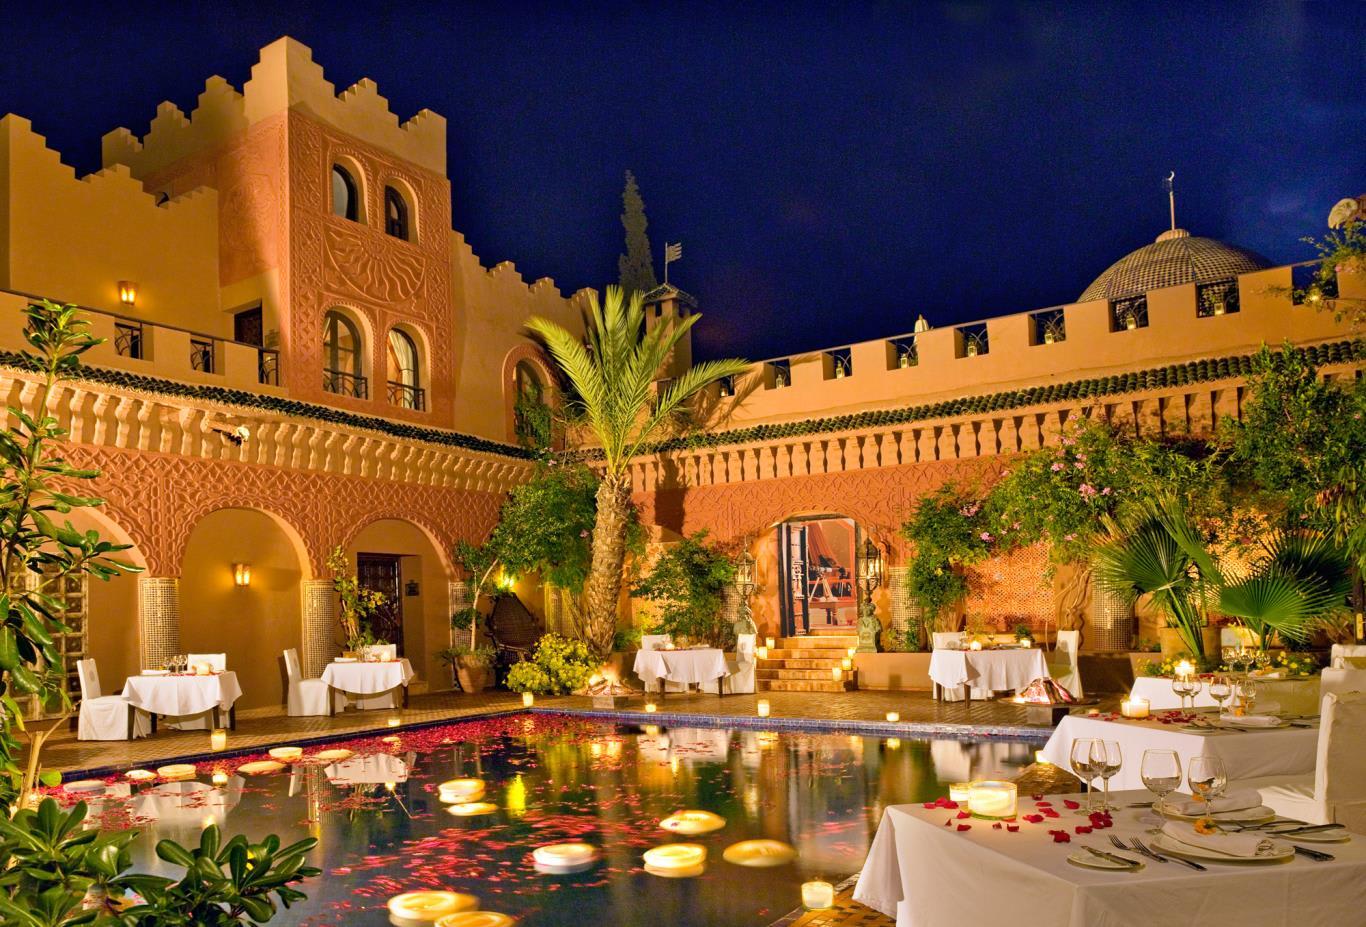 kasbah-dining-reflecting pool